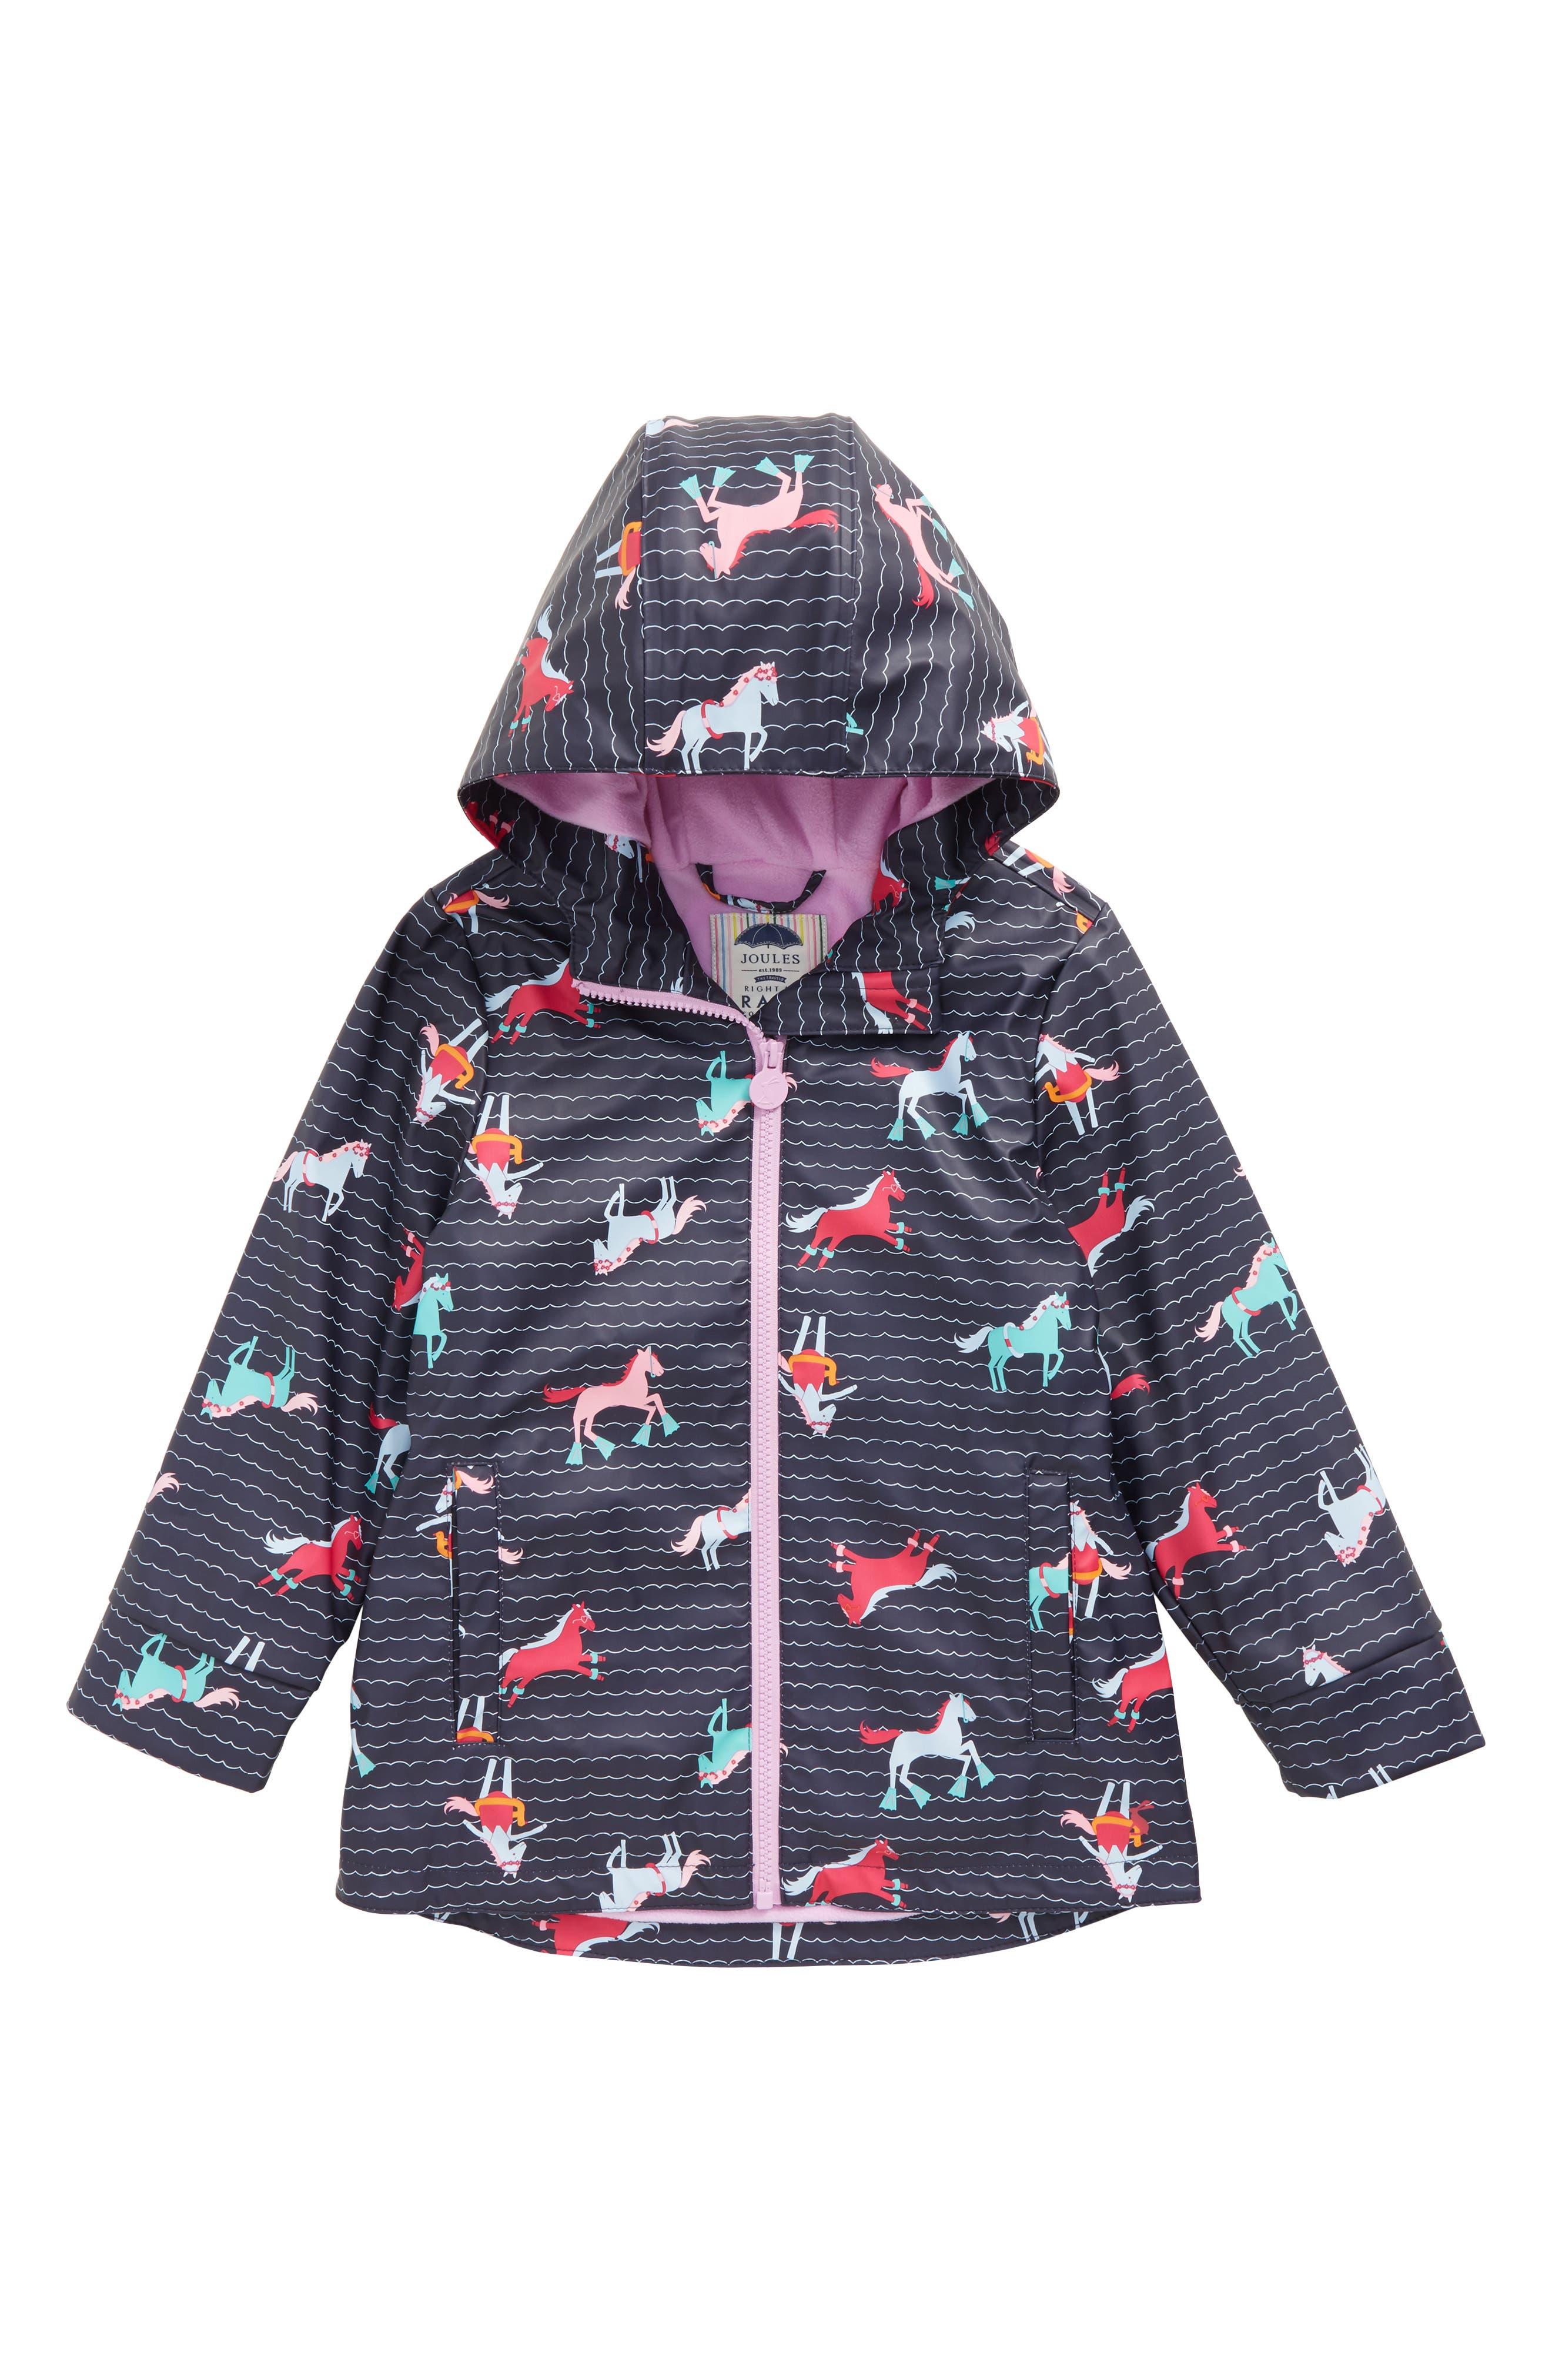 Main Image - Joules Fleece Lined Rain Jacket (Toddler Girls, Little Girls & Big Girls)